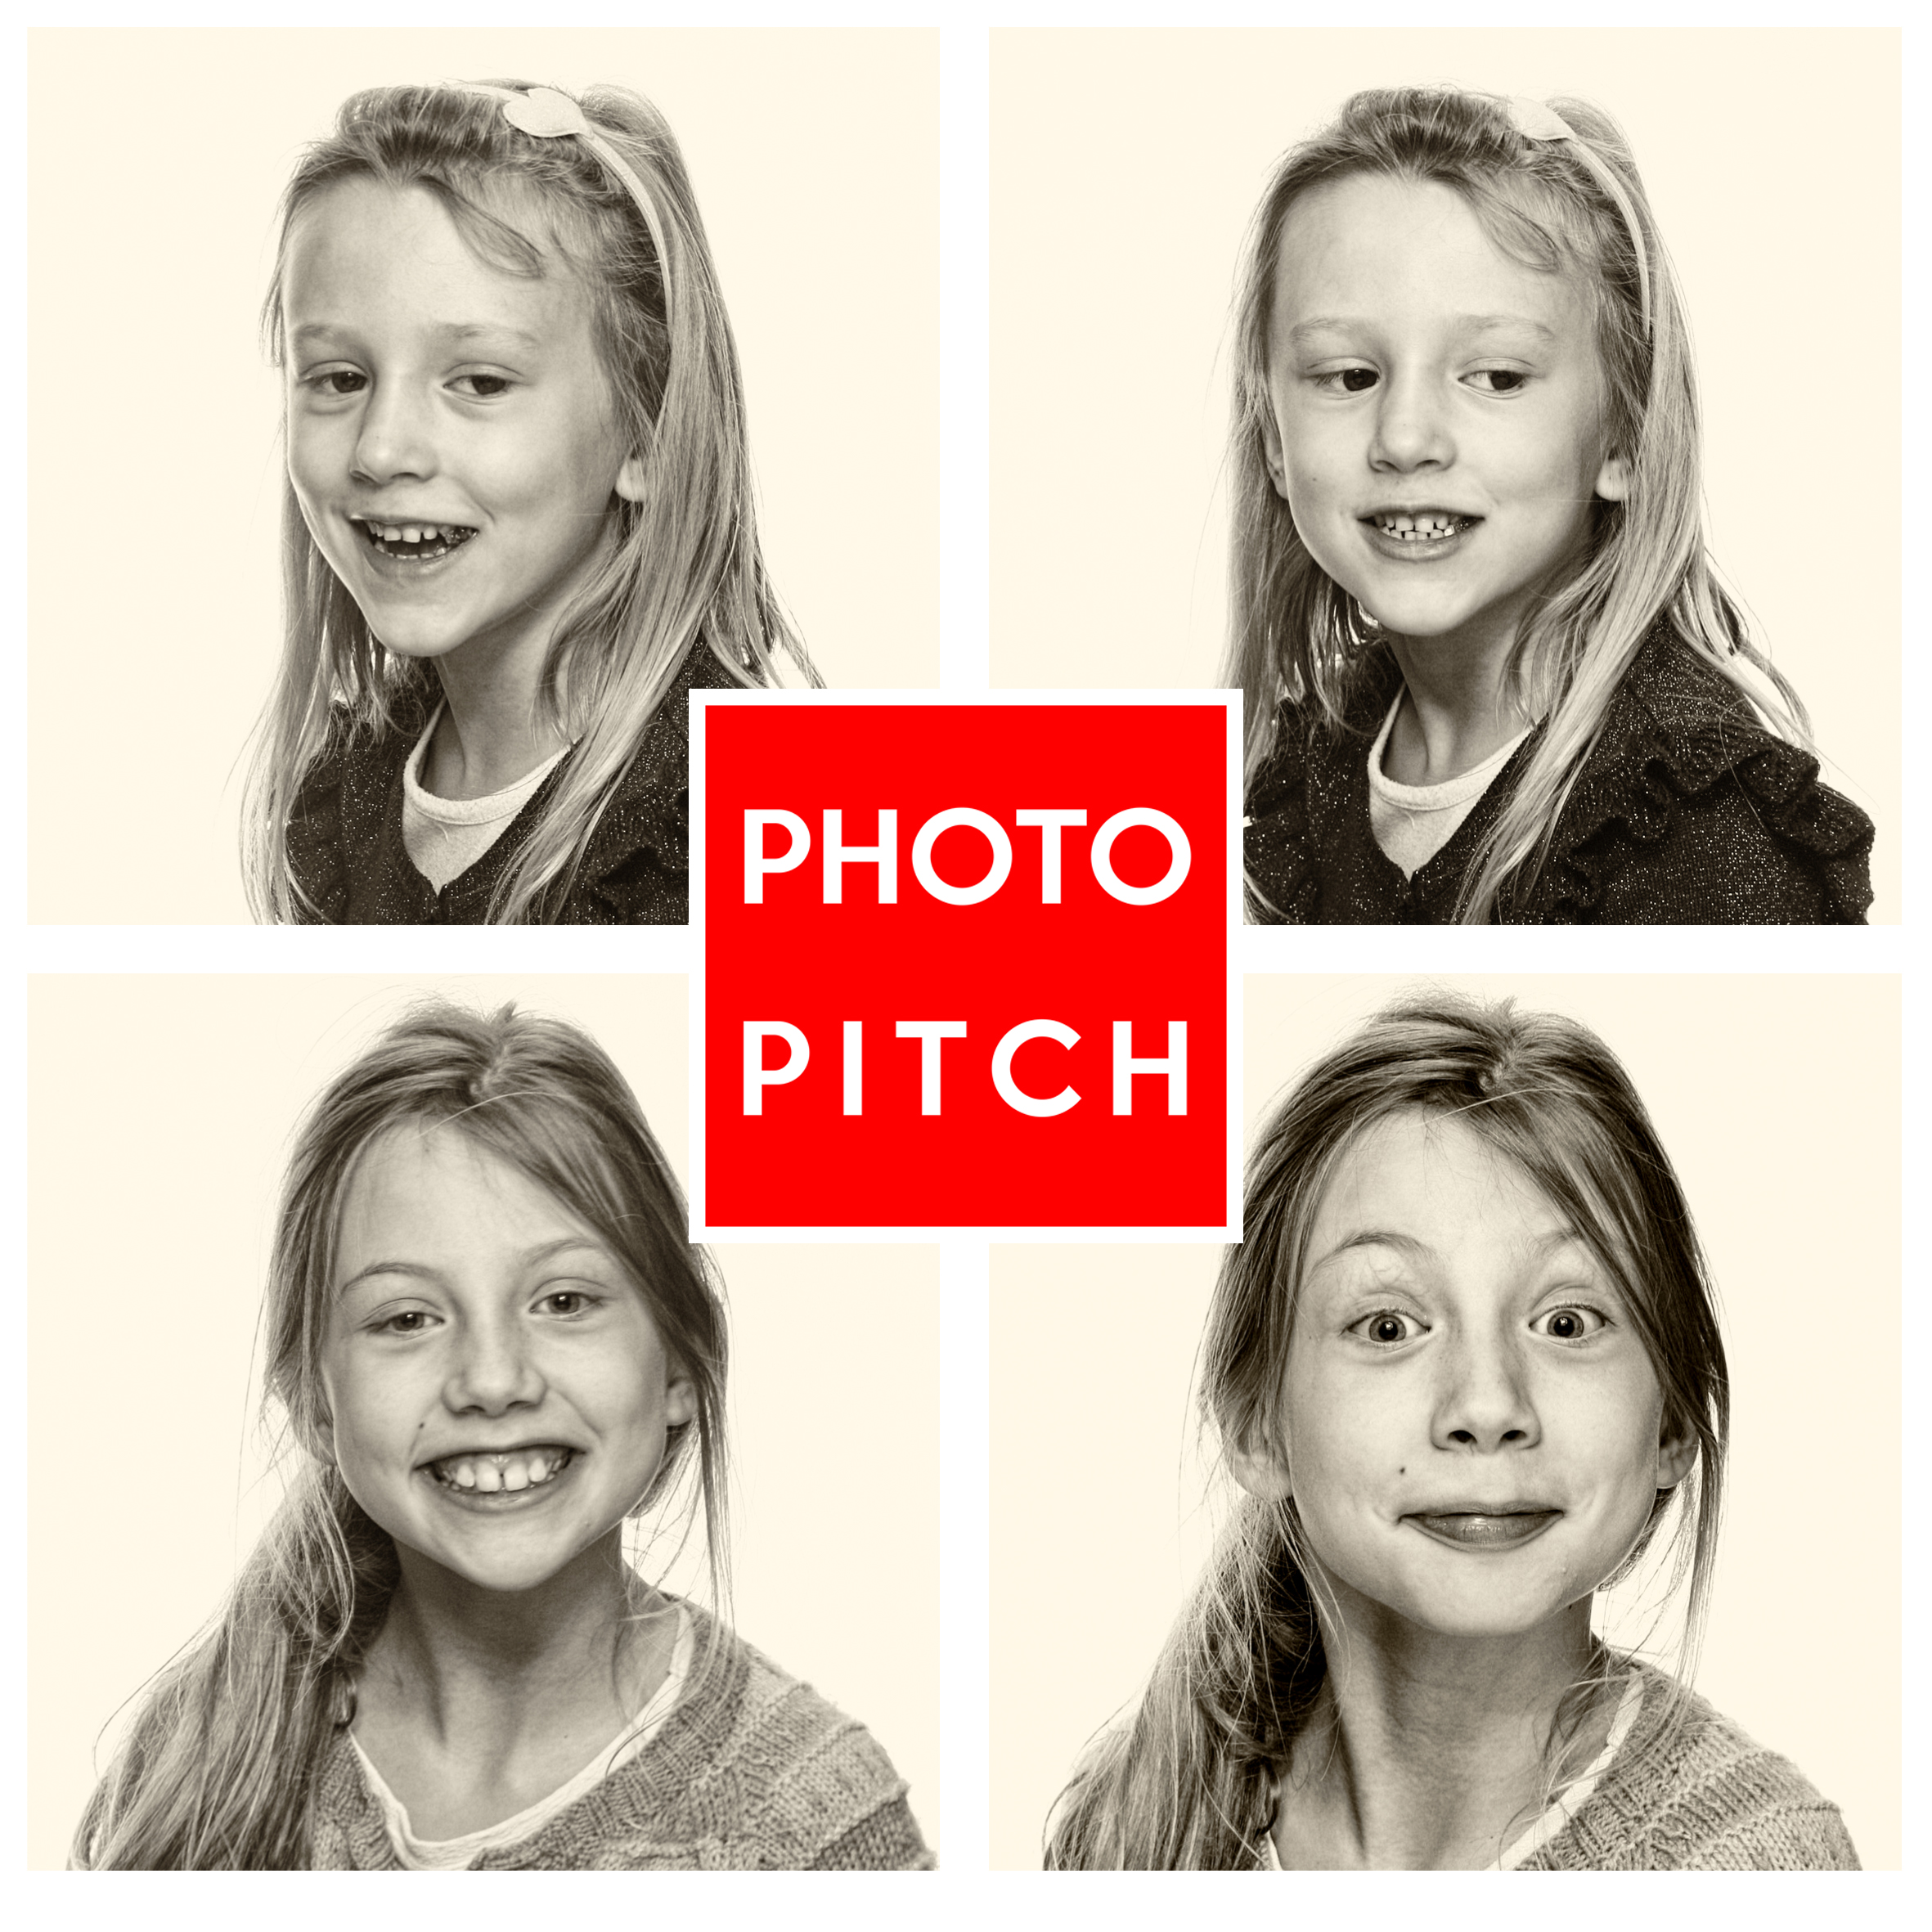 Kwaliteitsfoto's laat je printen bij Fotostudio Photopitch. (Foto: Fotopitch)